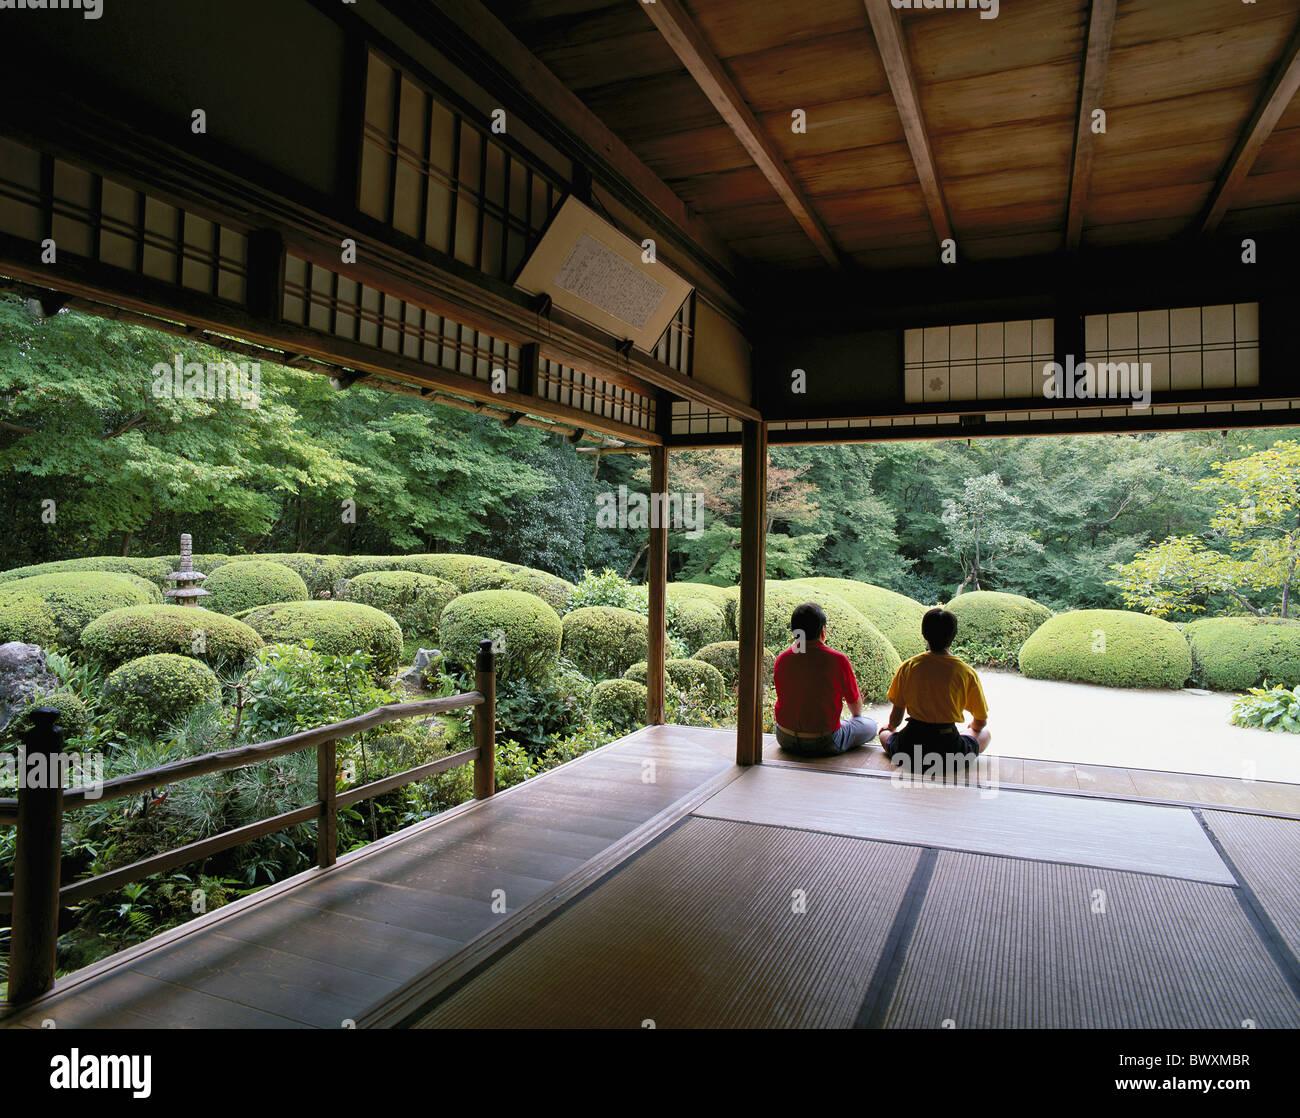 Temple Texas Traditional Home: Garden House Home Japan Asia Men Back View Shisendo Temple